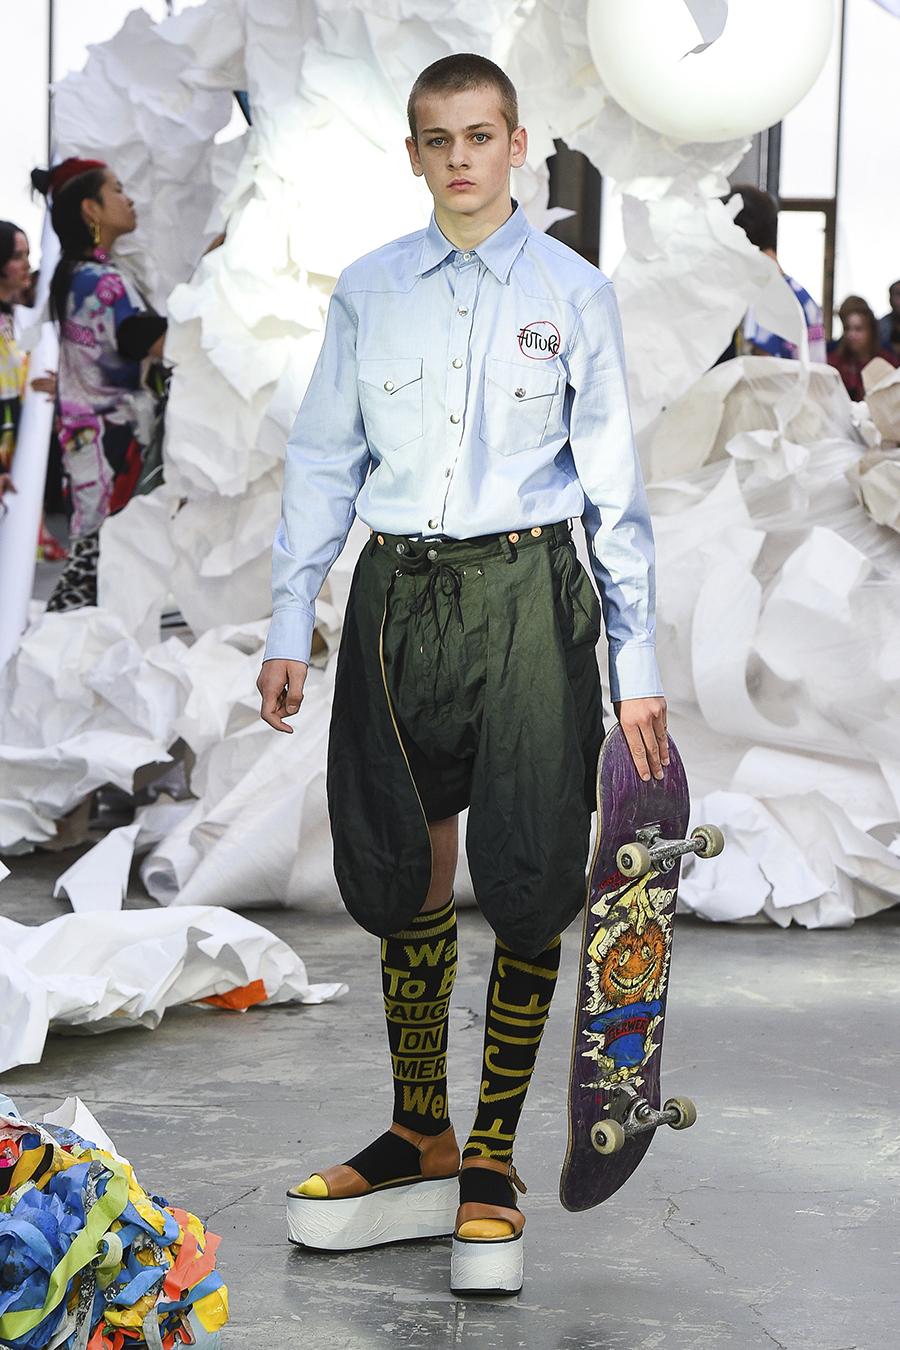 30s-Inspired Streetwear : Skateboard Clothes |Skateboard Fashion Trends